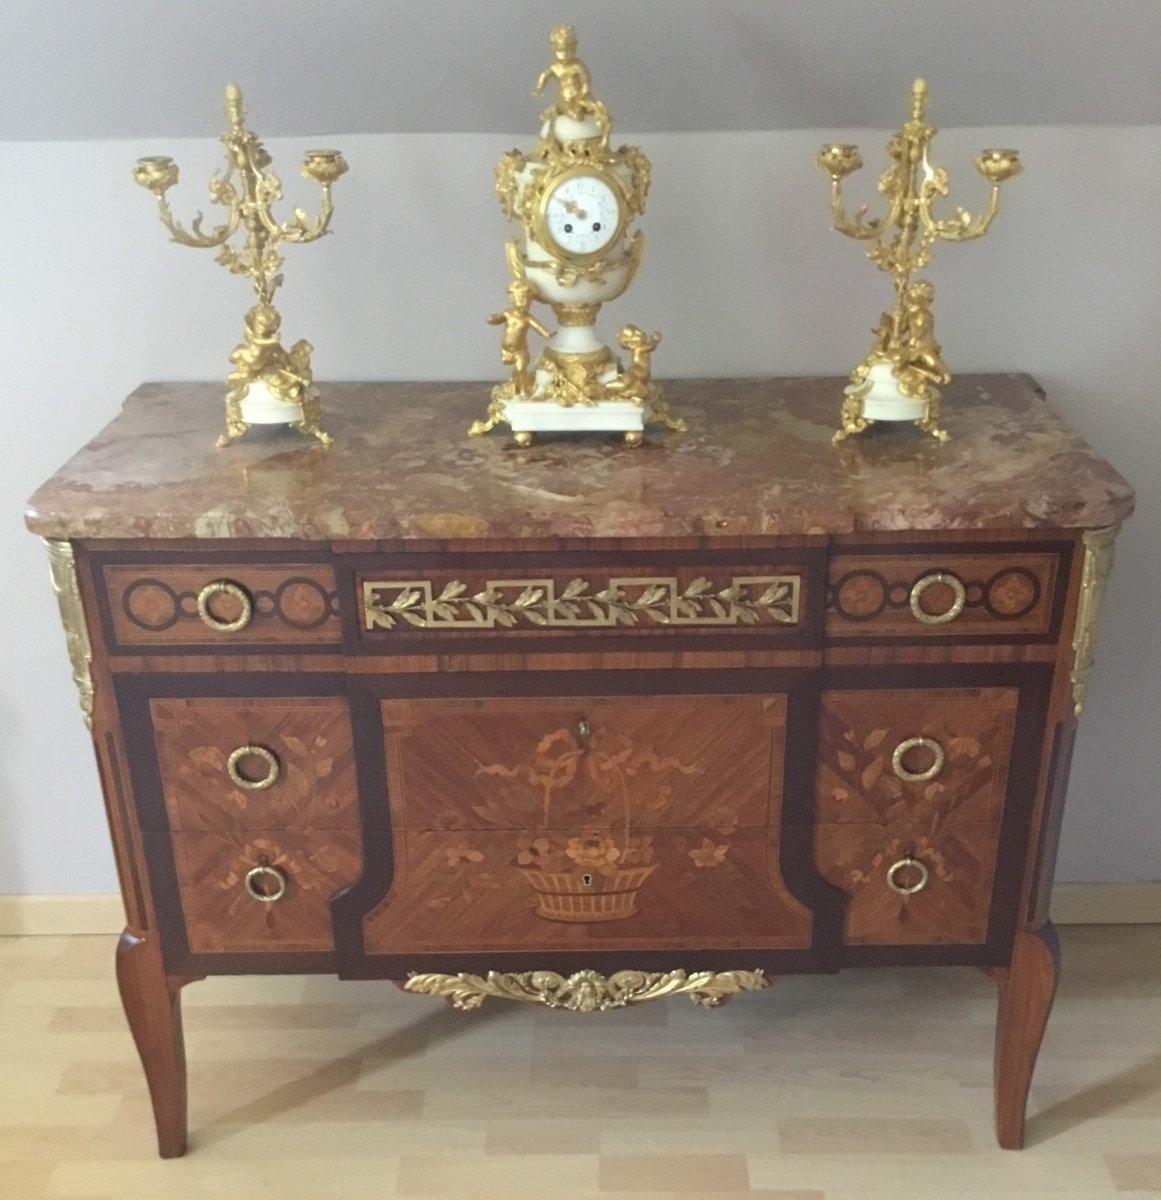 Jean-Luc KOELLER Antiquités